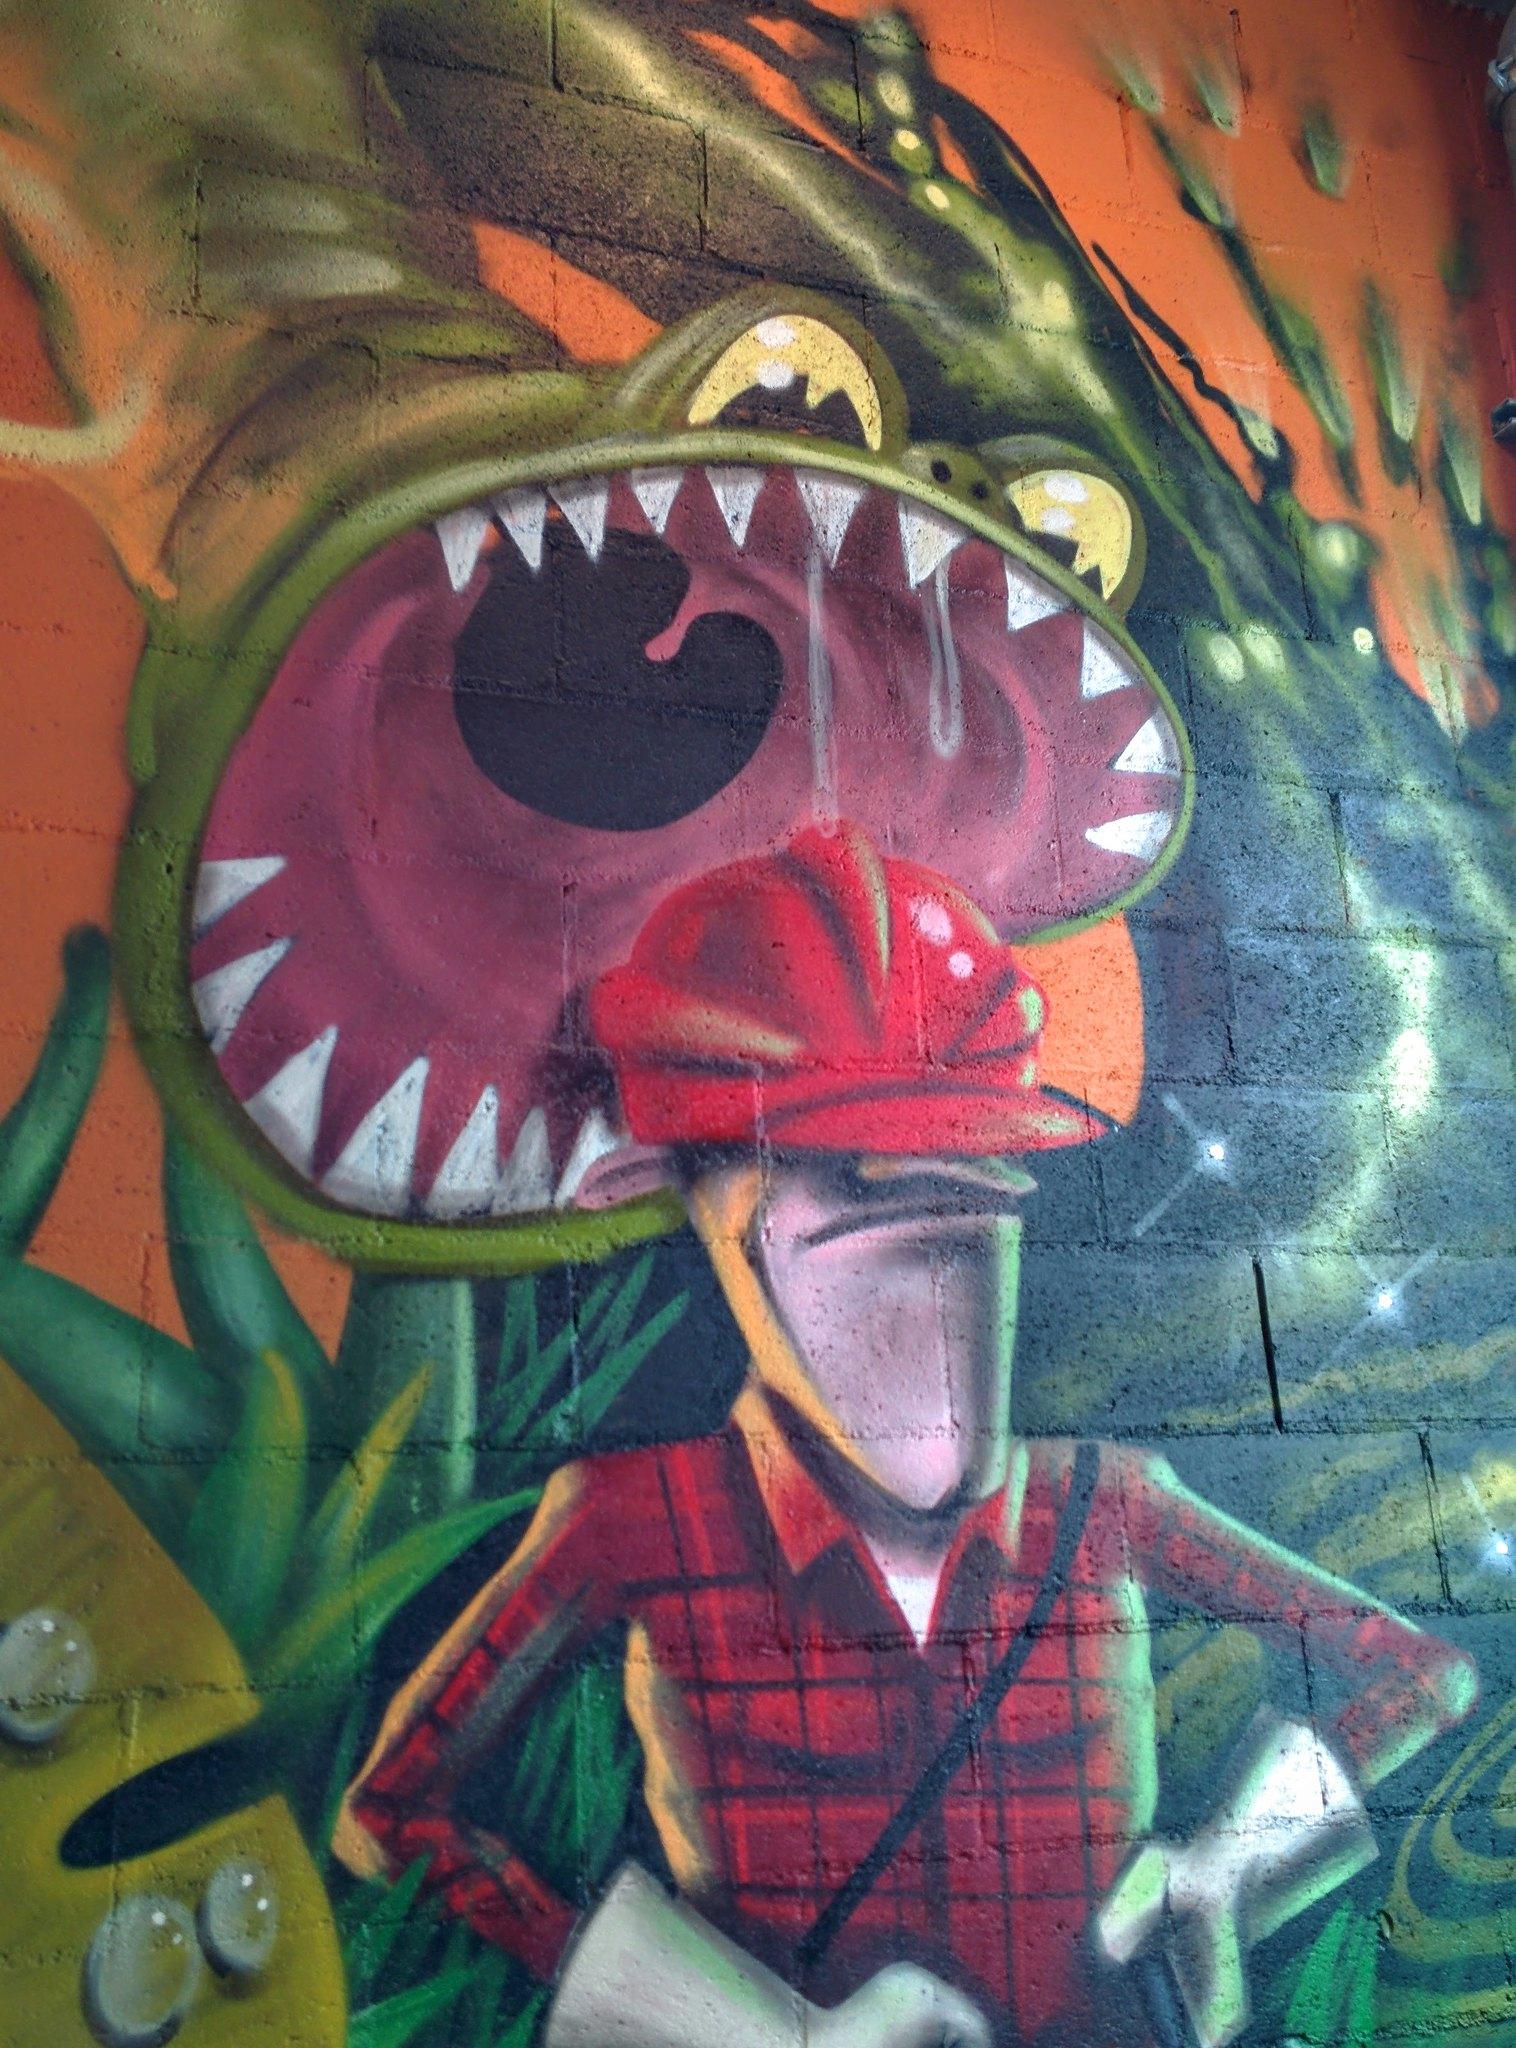 Graffiti in the hostel